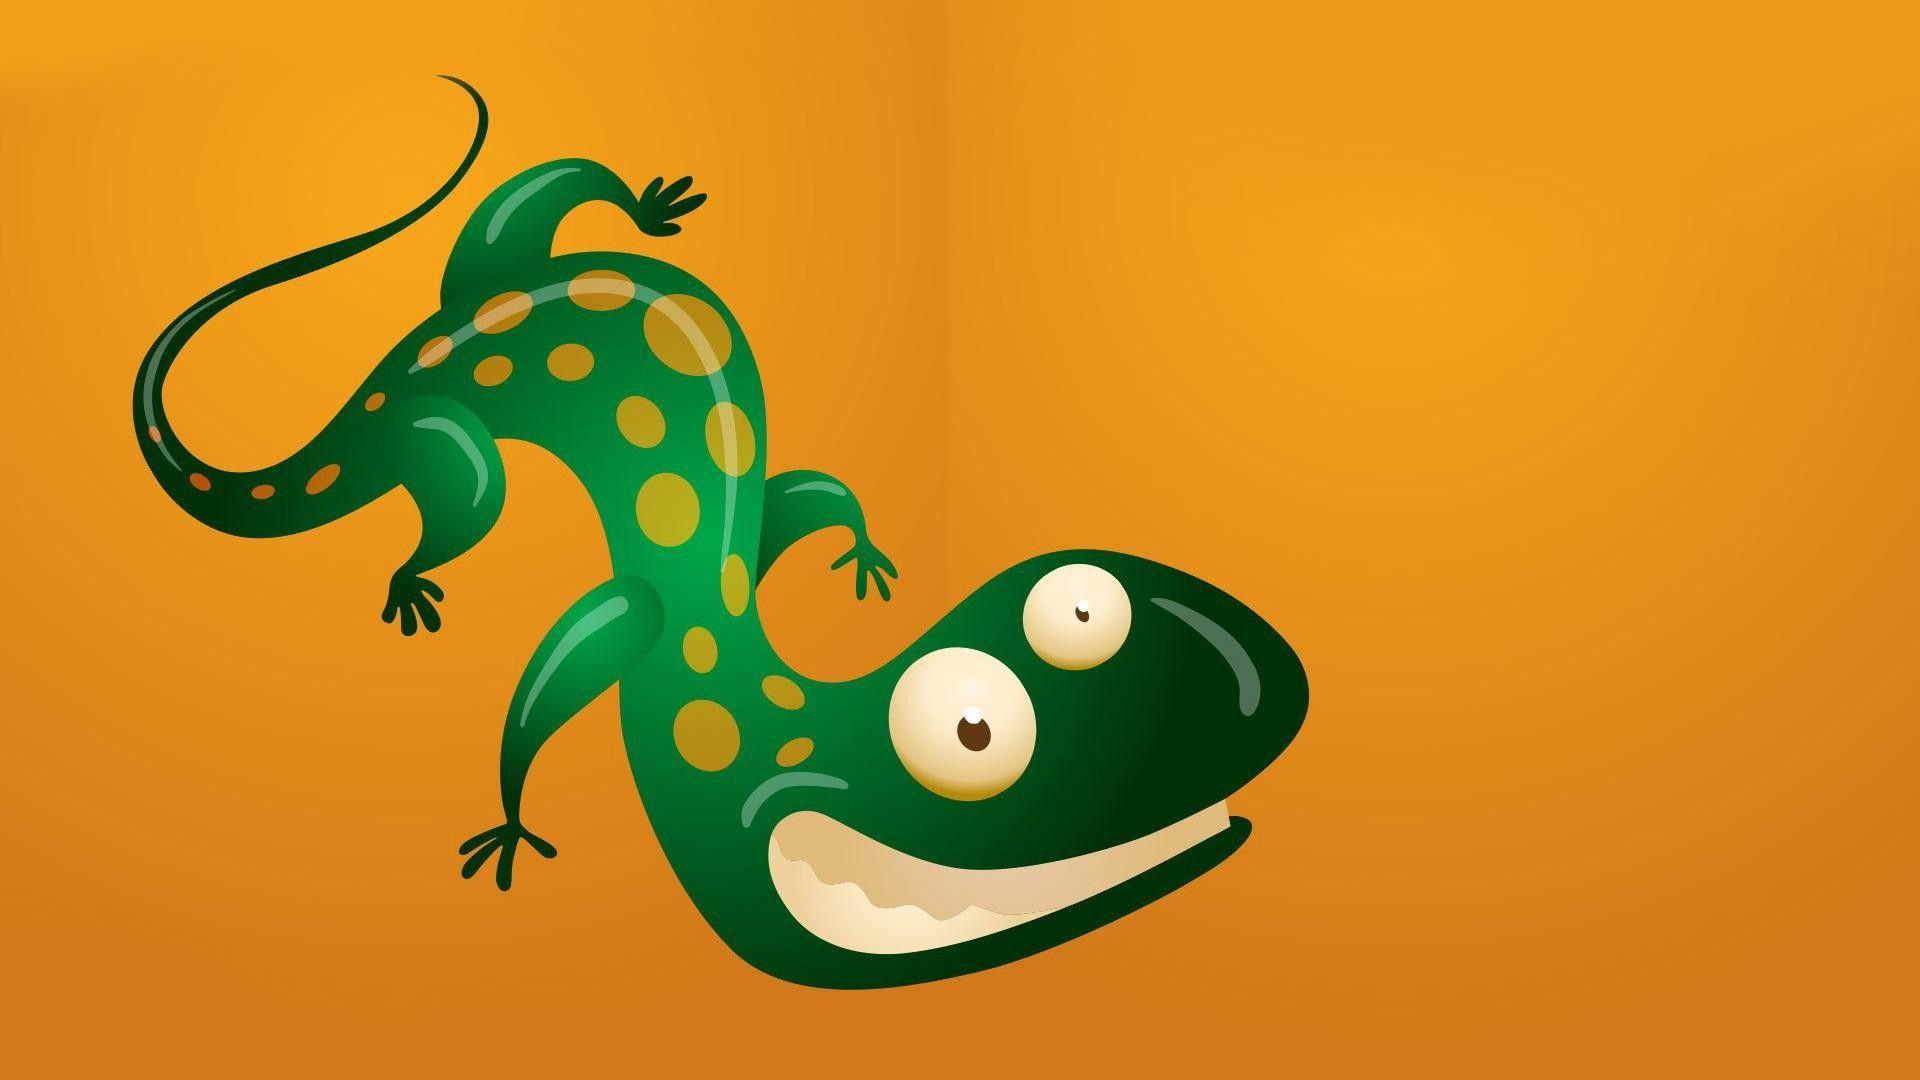 Lizard Background